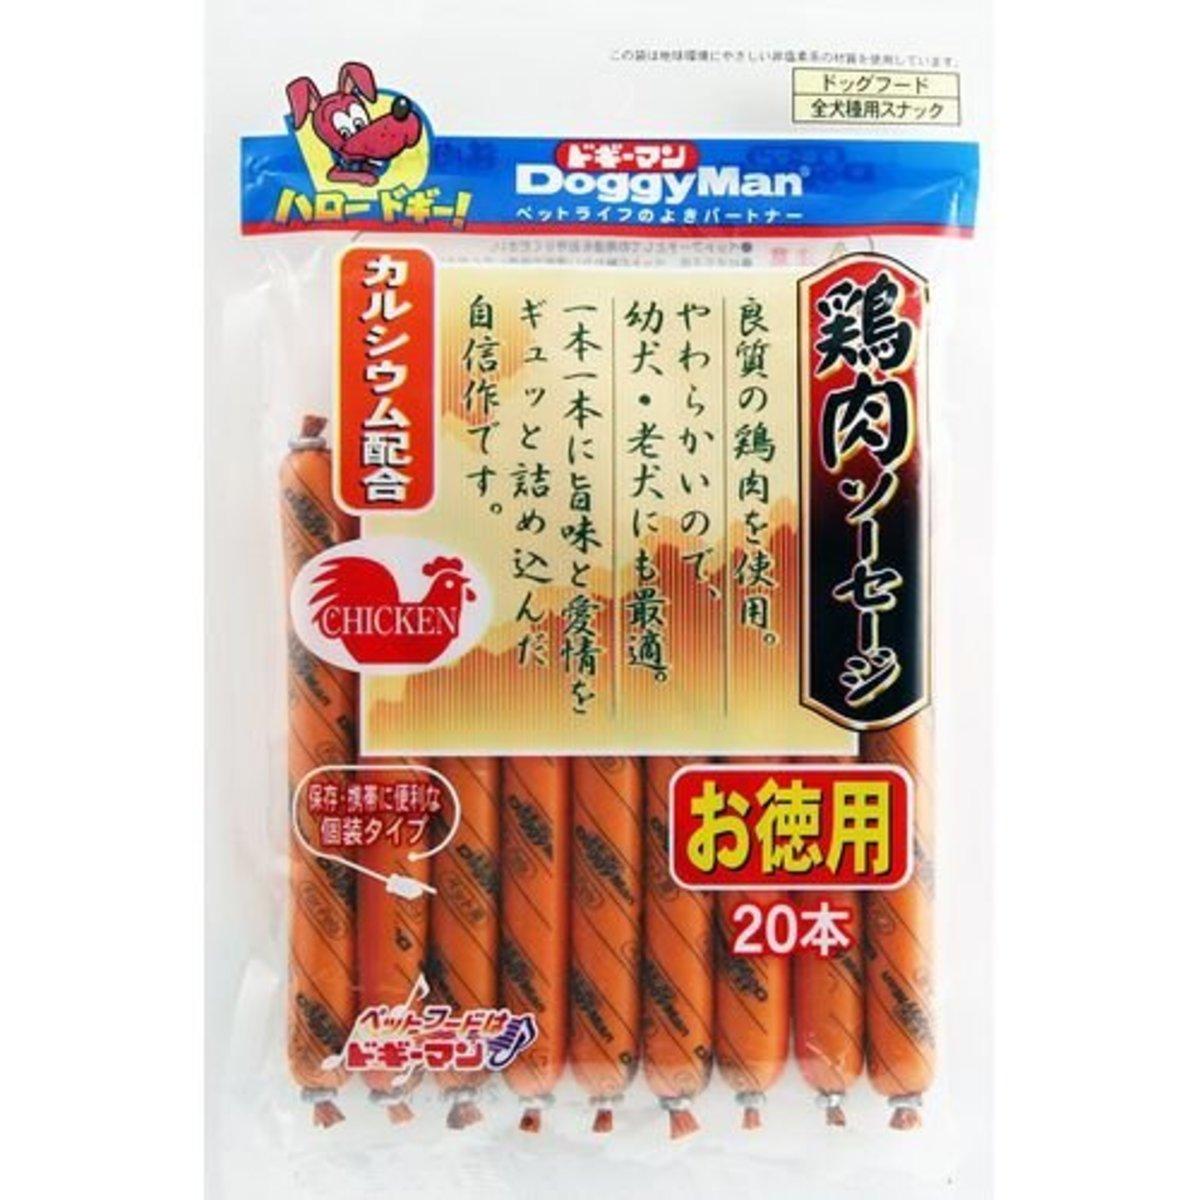 Chicken Sausages (20pcs) #81551 F3